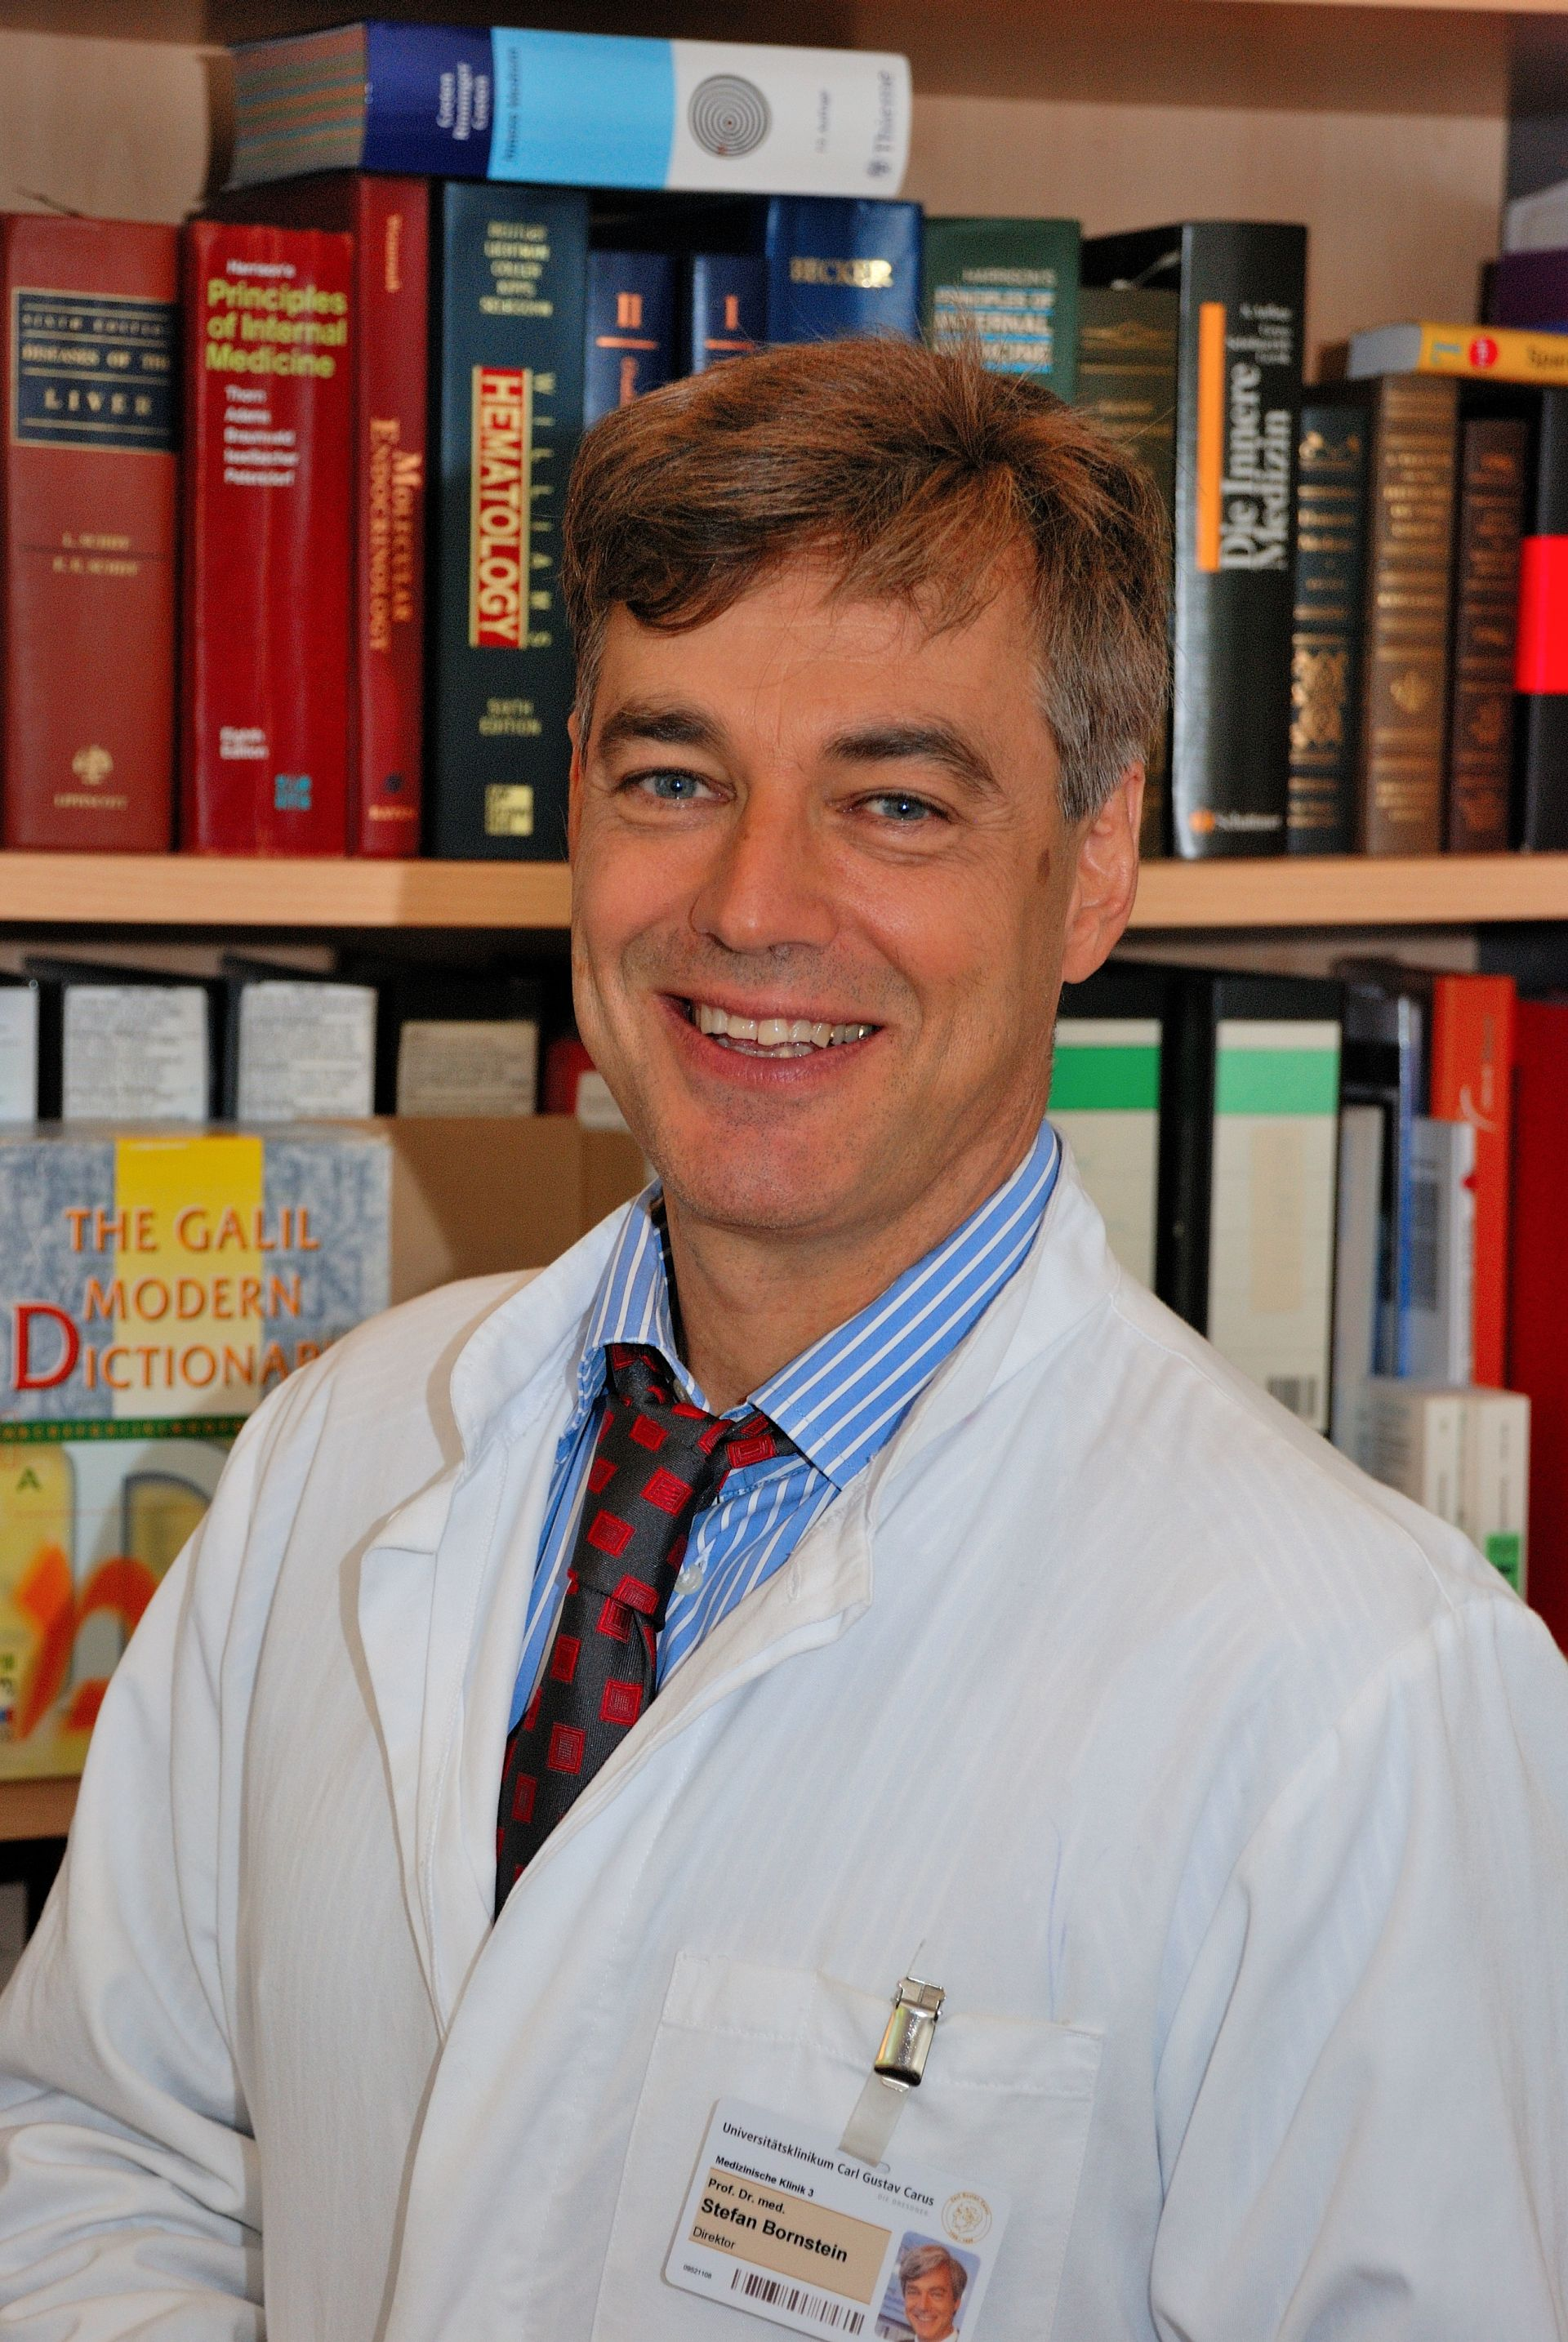 Prof. Bornstein 2